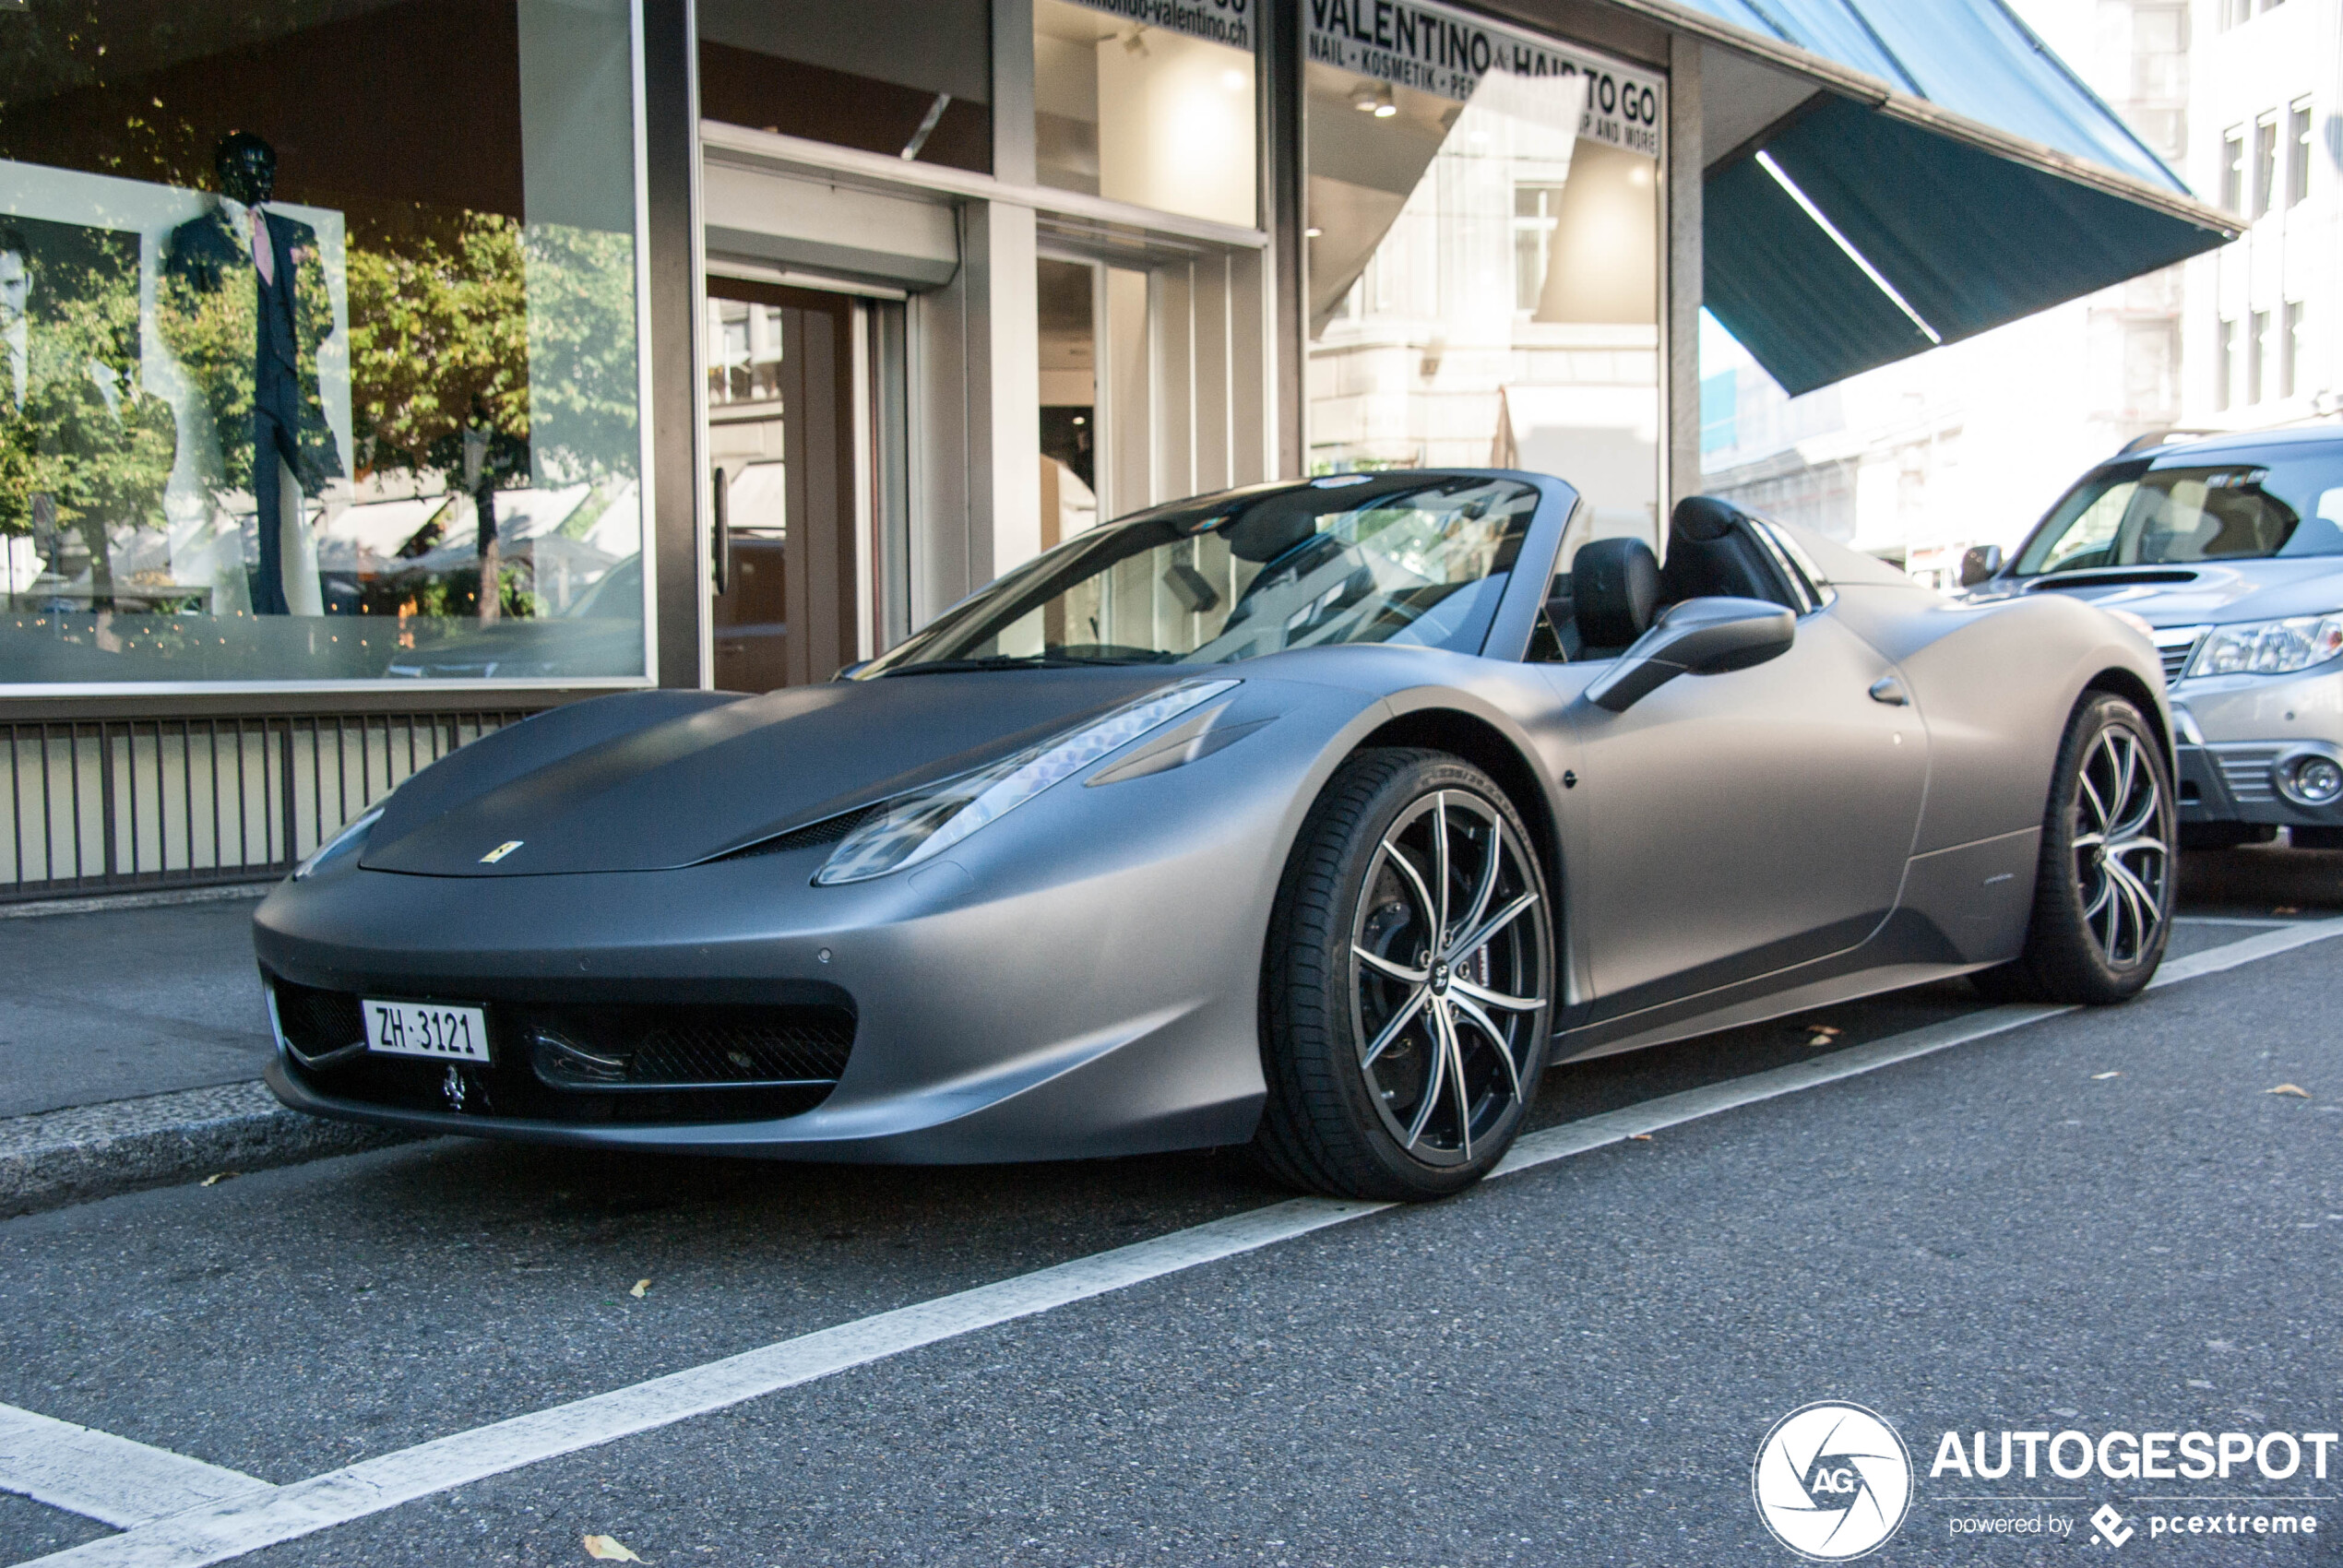 Ferrari 458 Spider - 7 March 2020 - Autogespot